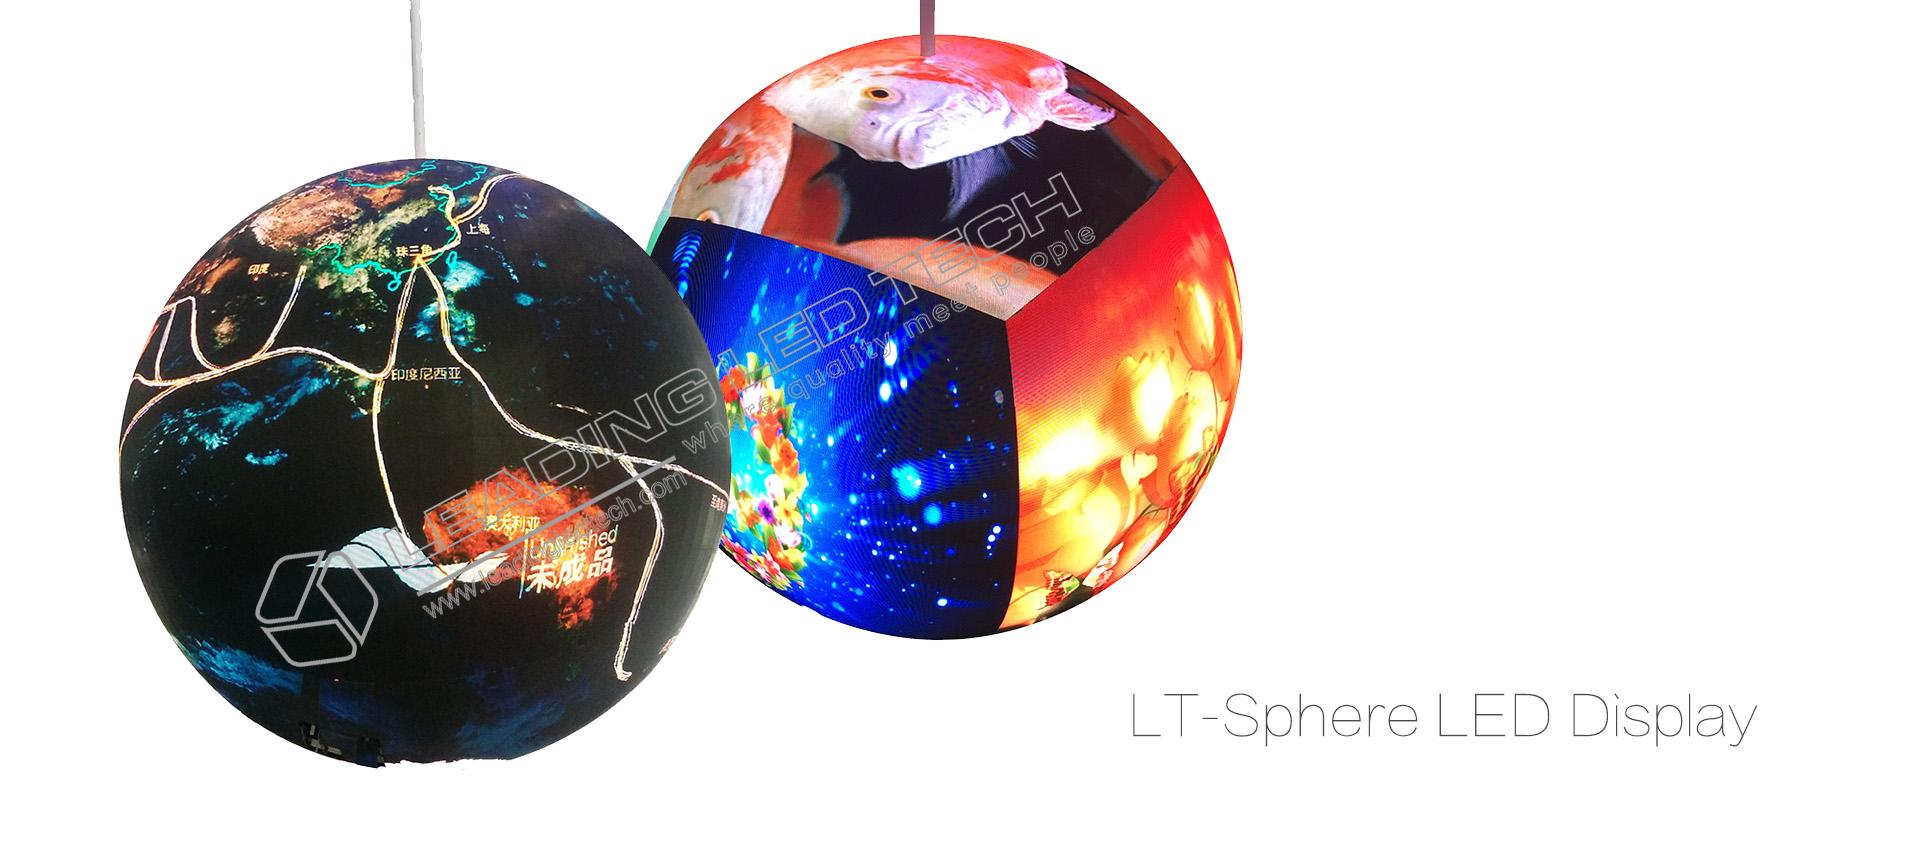 Sphere-LED-Display- factory